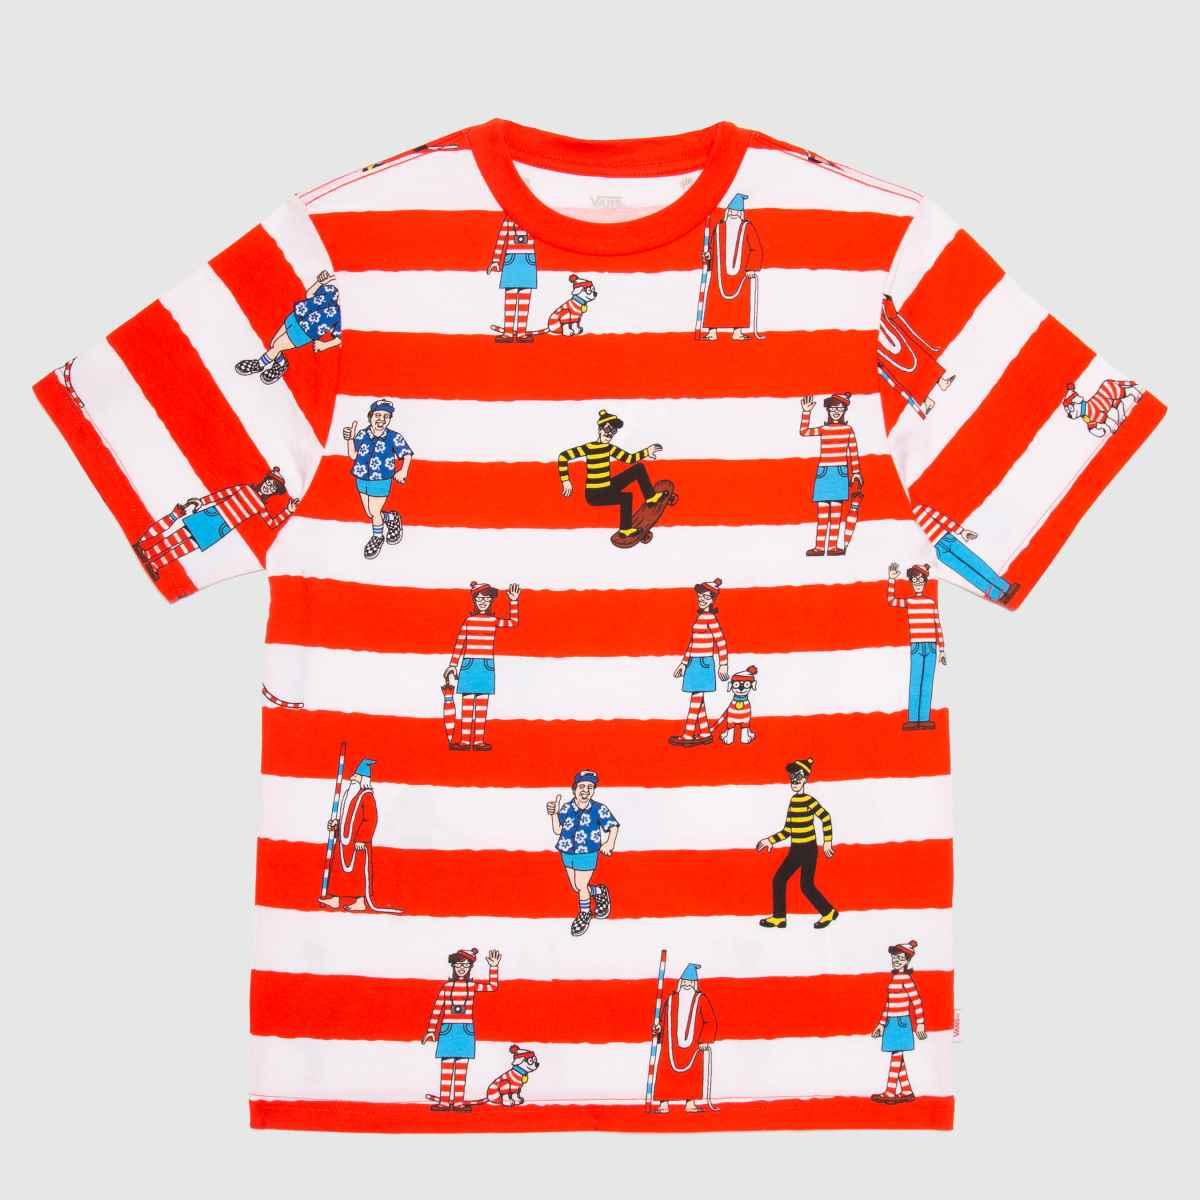 Vans White & Red Wheres Waldo